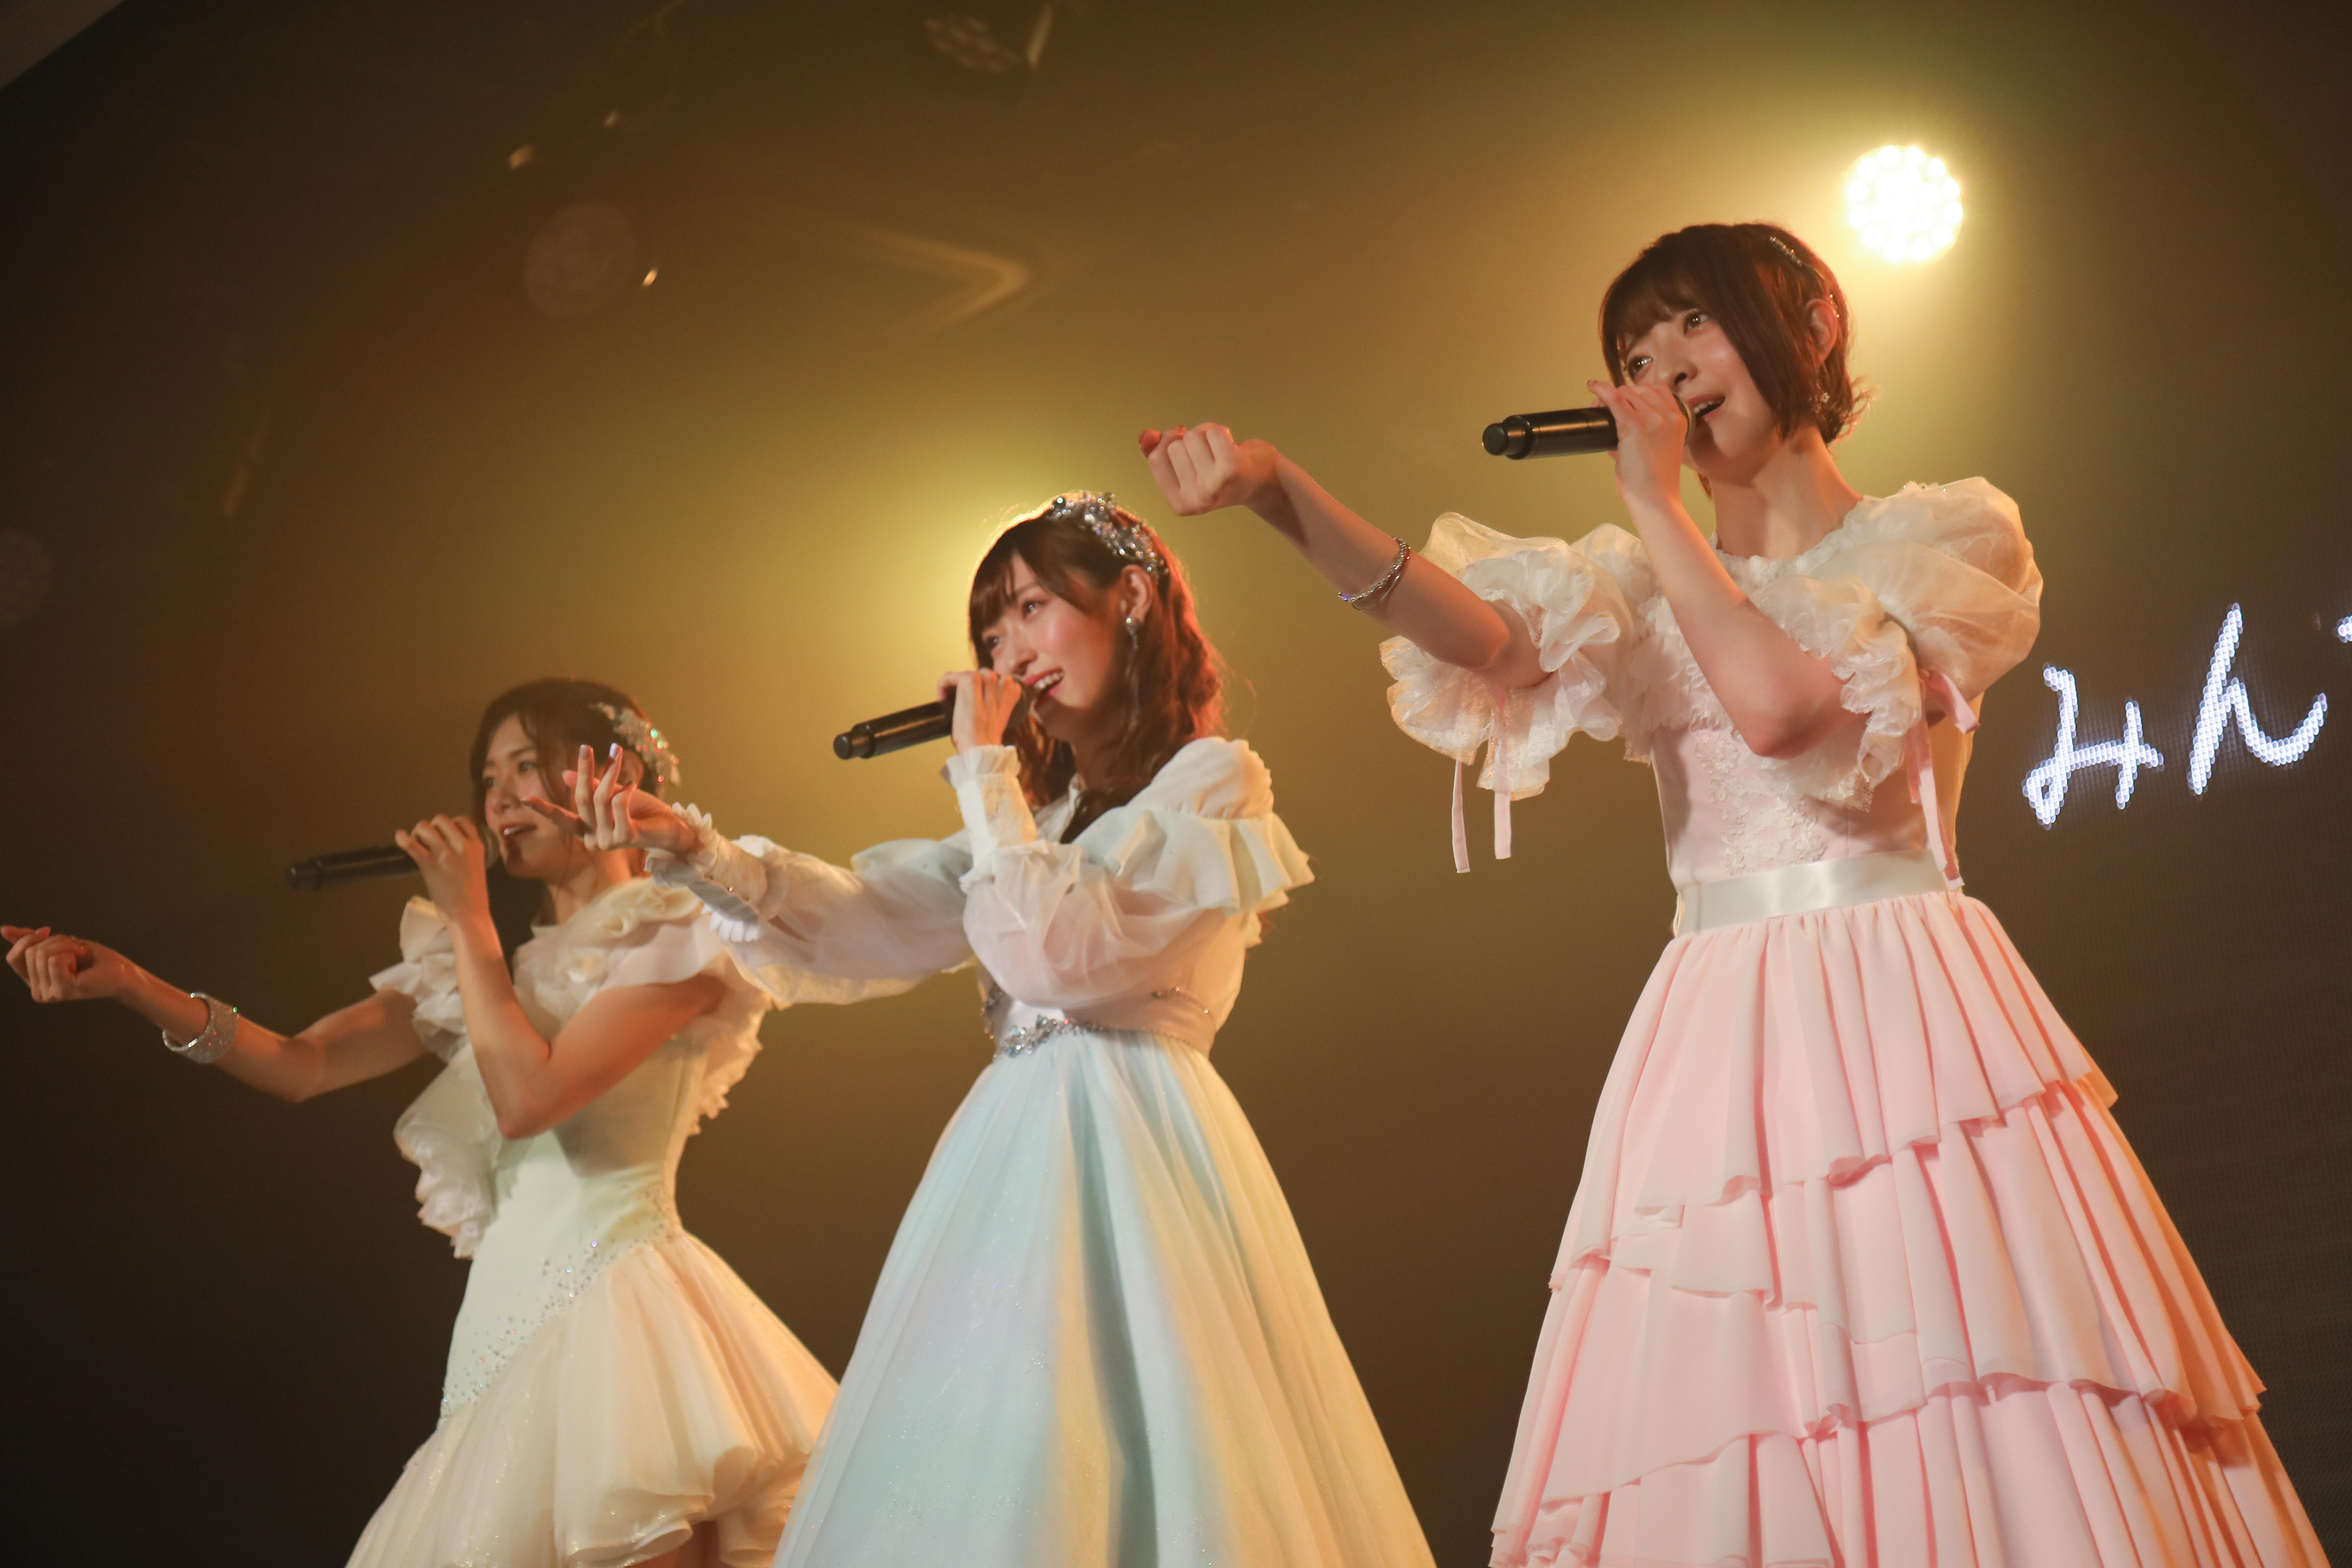 NGT48⼭⼝真帆、菅原りこ、⻑⾕川玲奈・卒業公演後のコメント発表!【写真14枚】の画像010